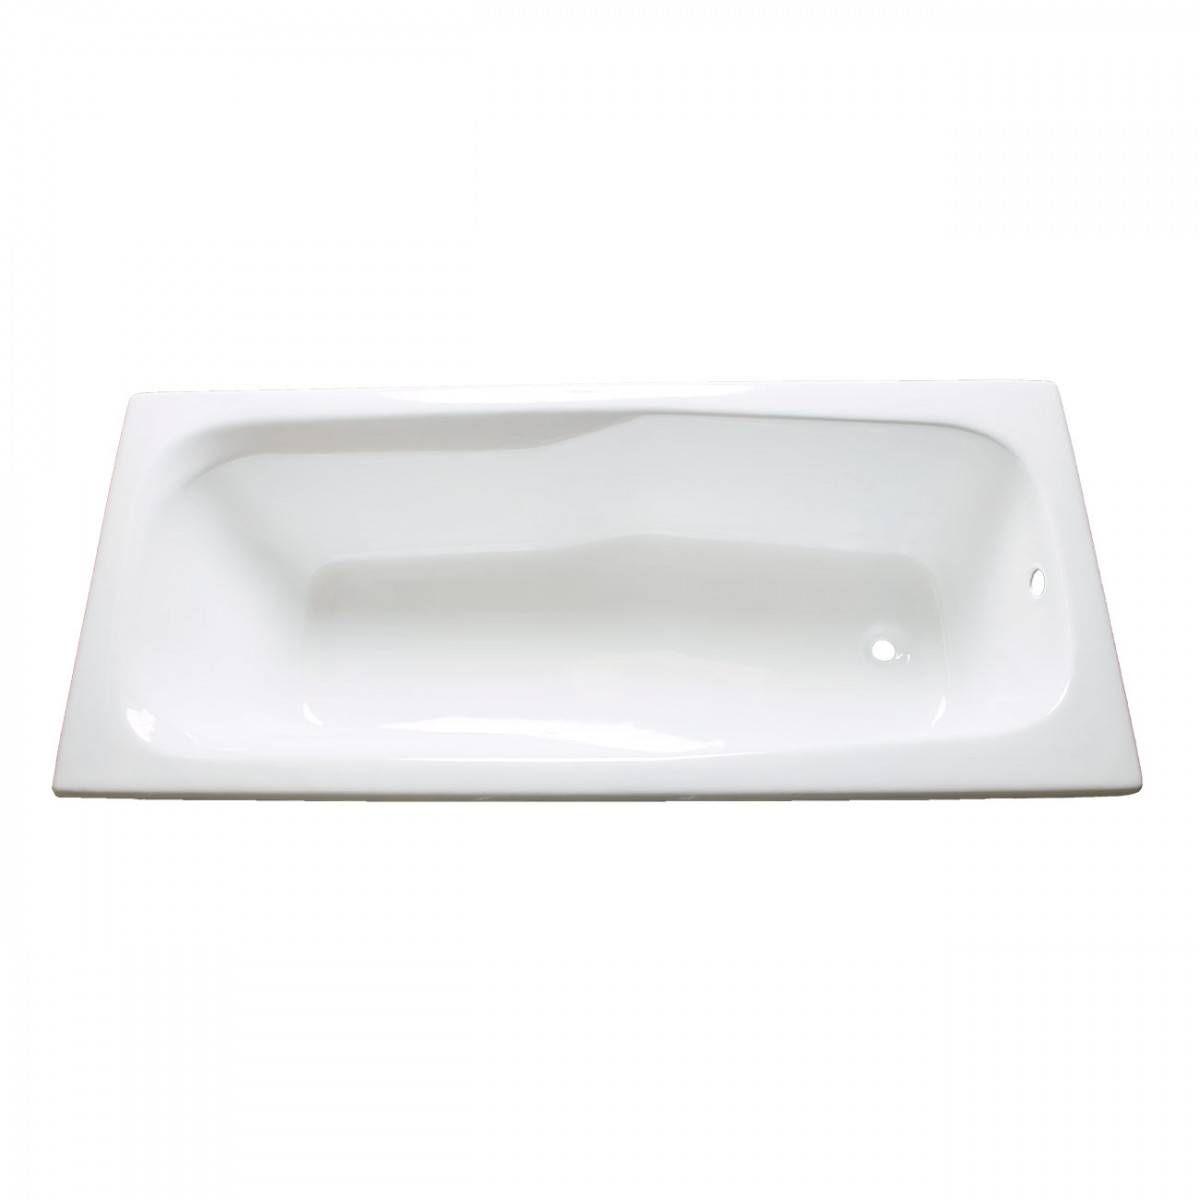 Greco 71 Inch Cast Iron Drop In Tub No Faucet Drillings In 2020 Drop In Tub Drop In Bathtub Vintage Tub